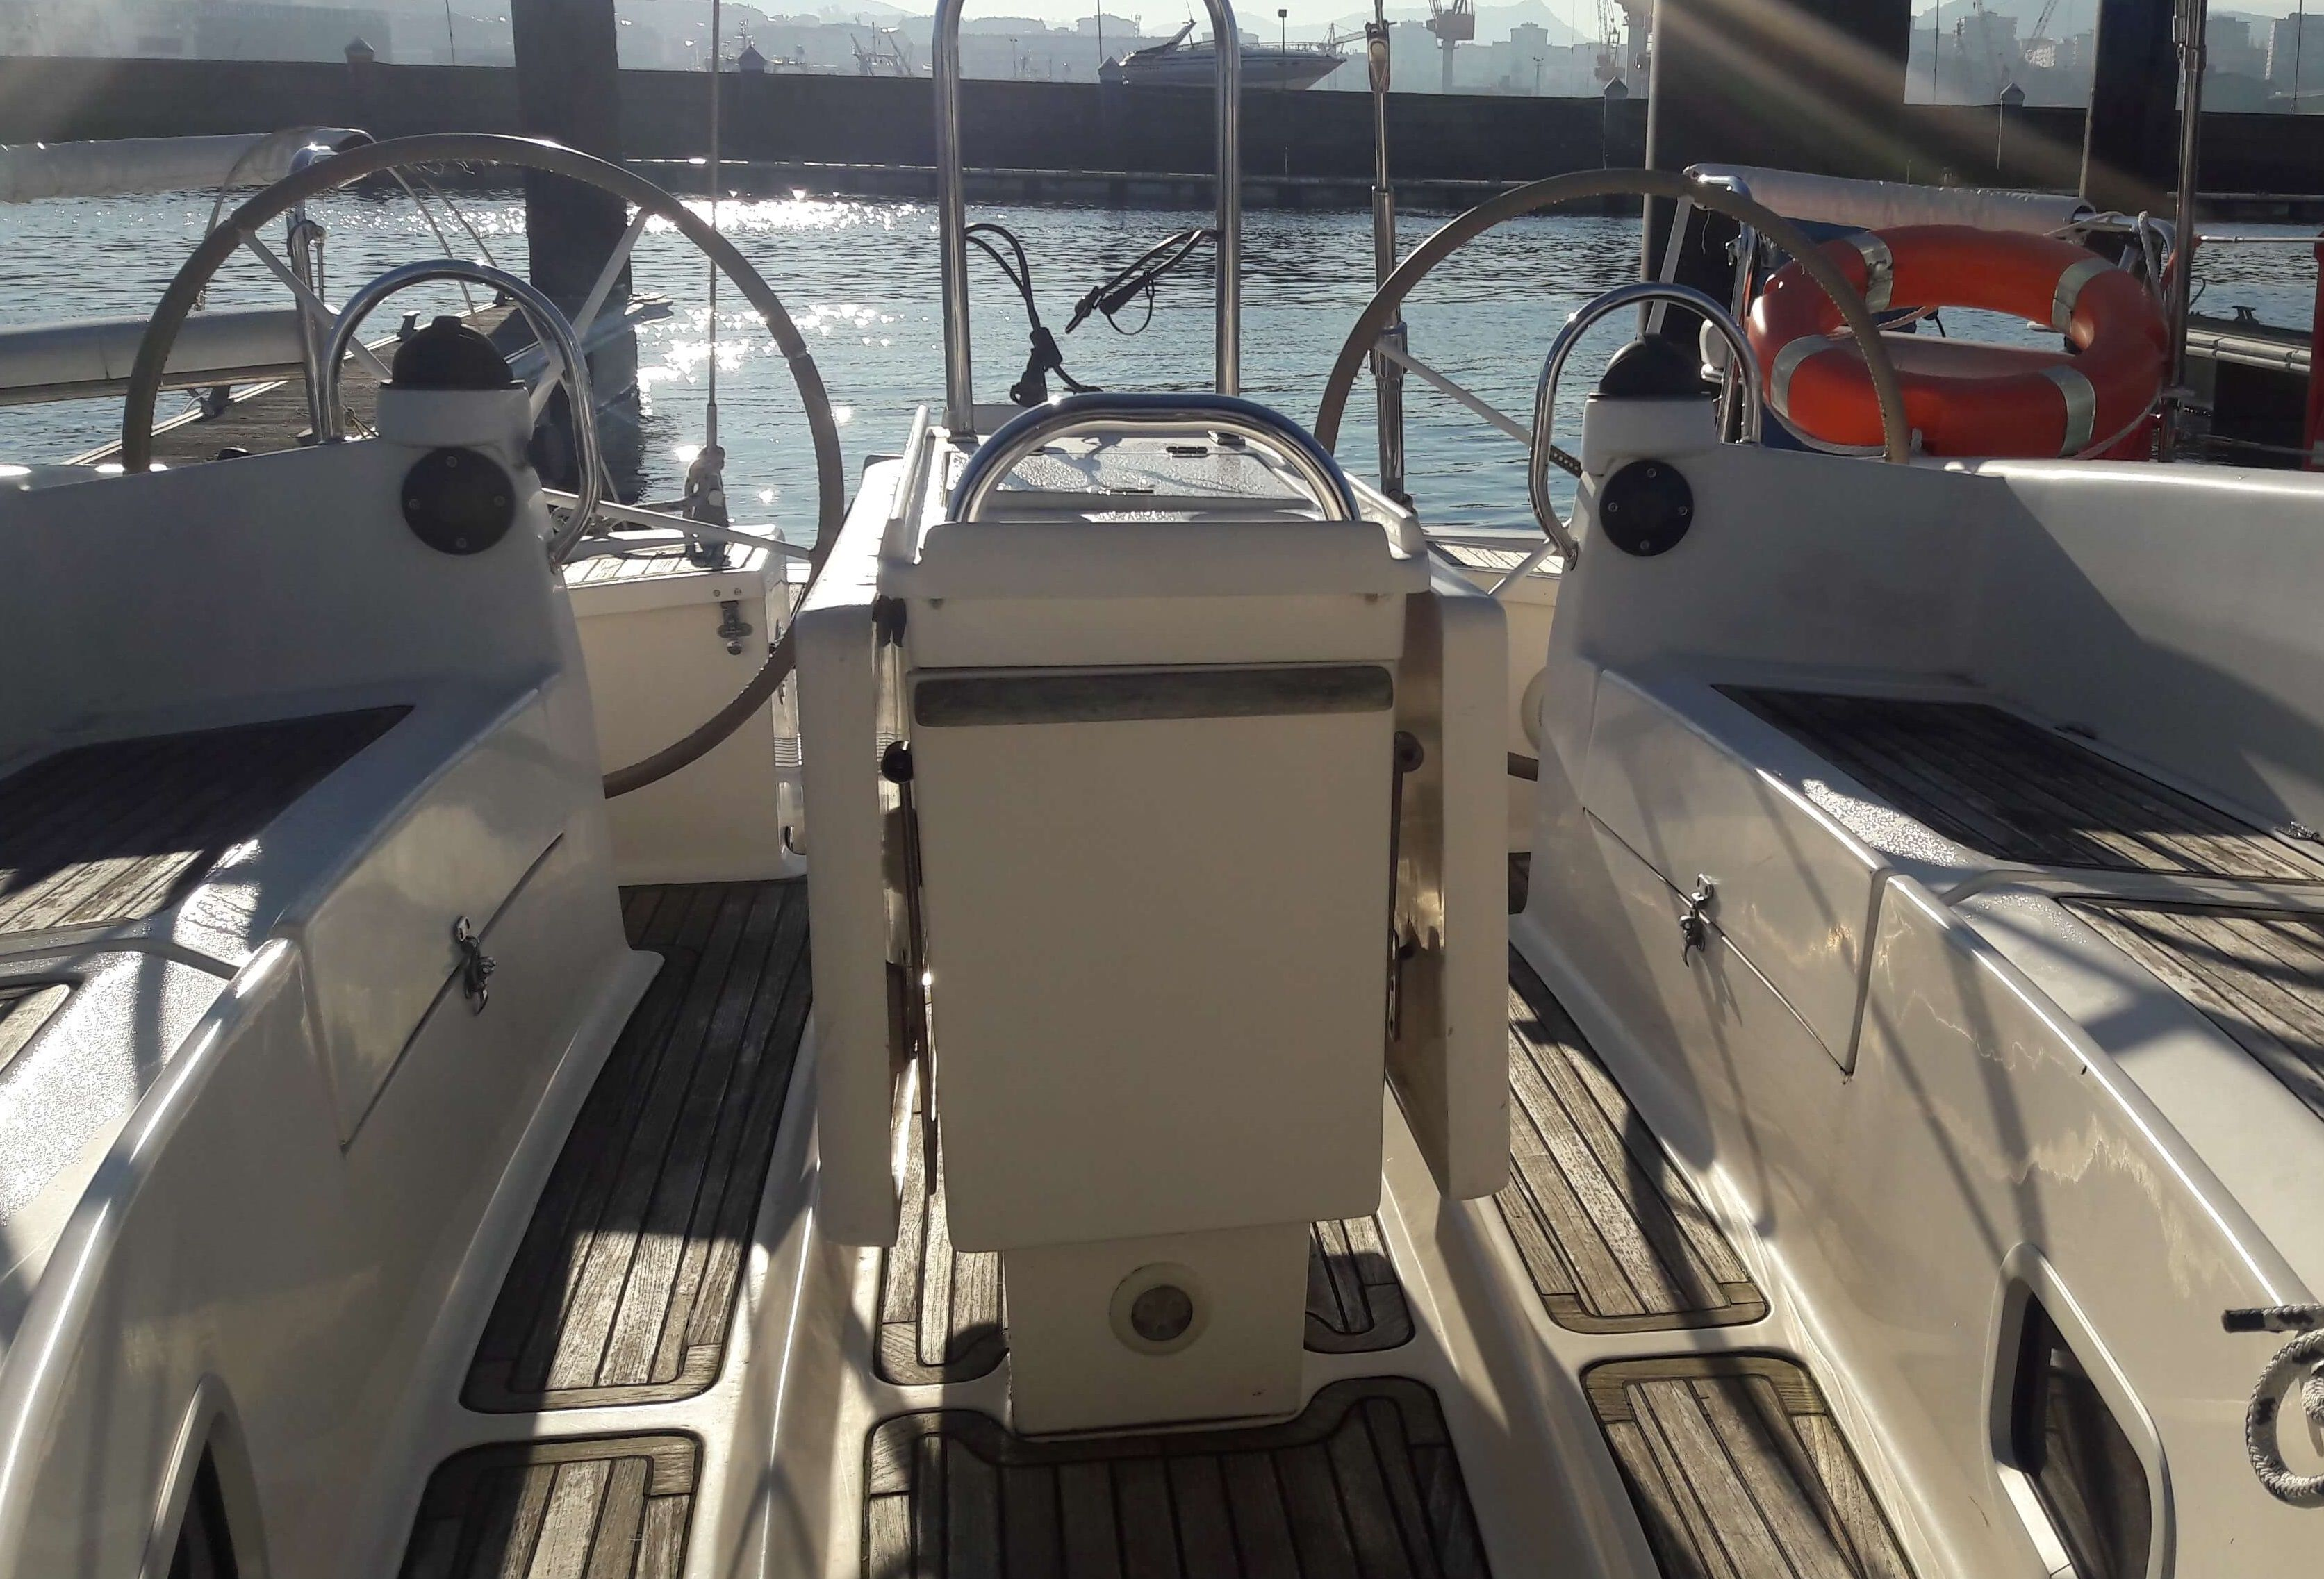 Ro400_bañera_Sailway_charter_Galicia_Ria_VIgo_Cies